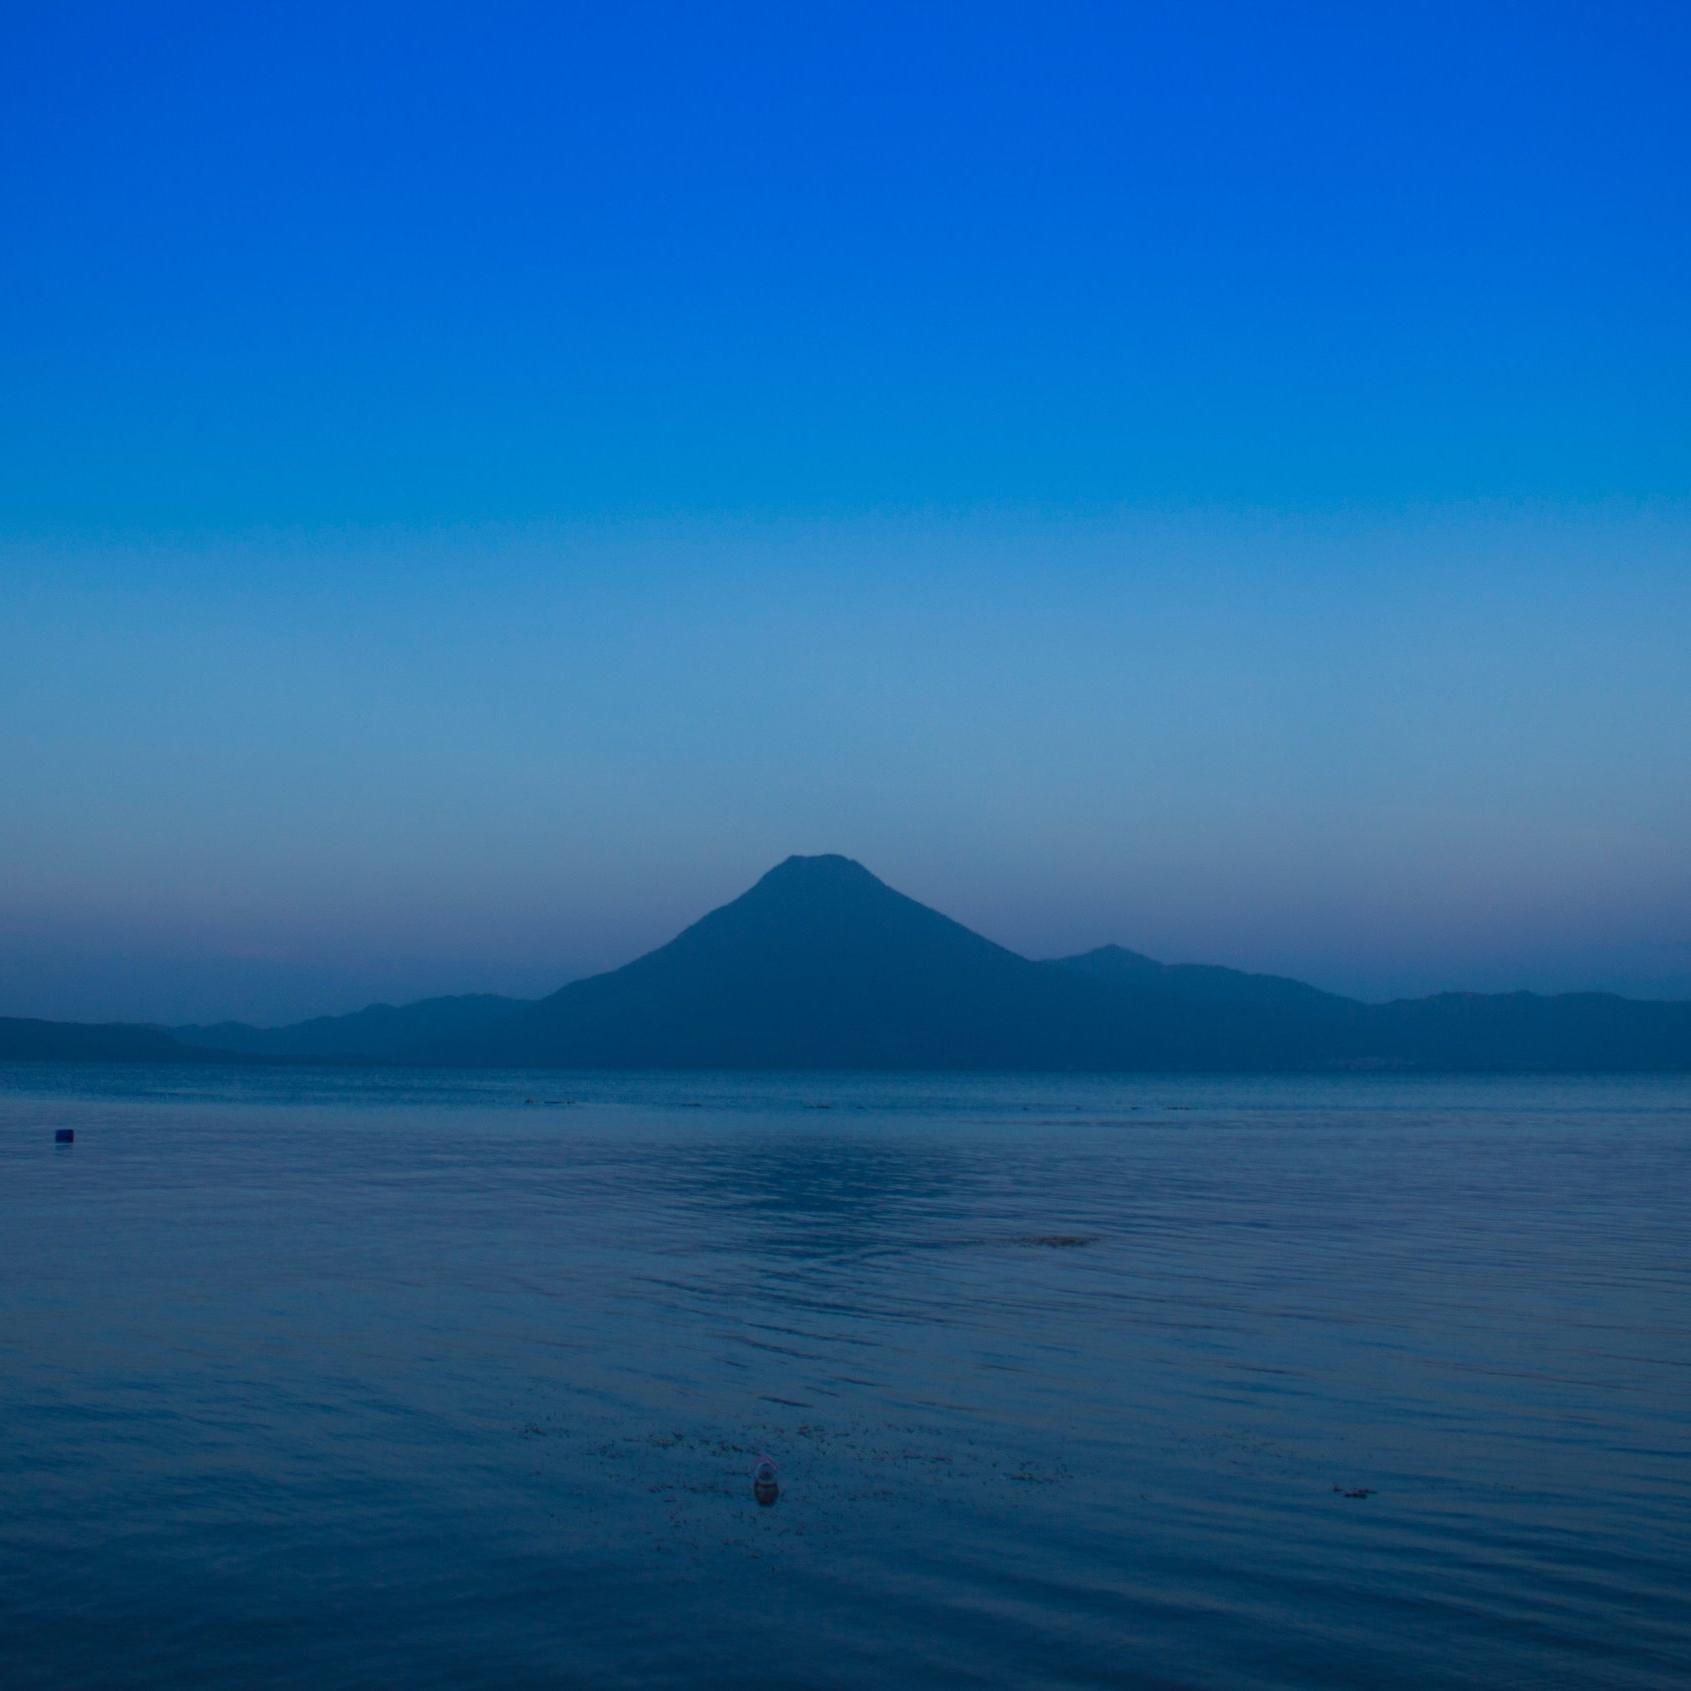 - Lake Atitlán